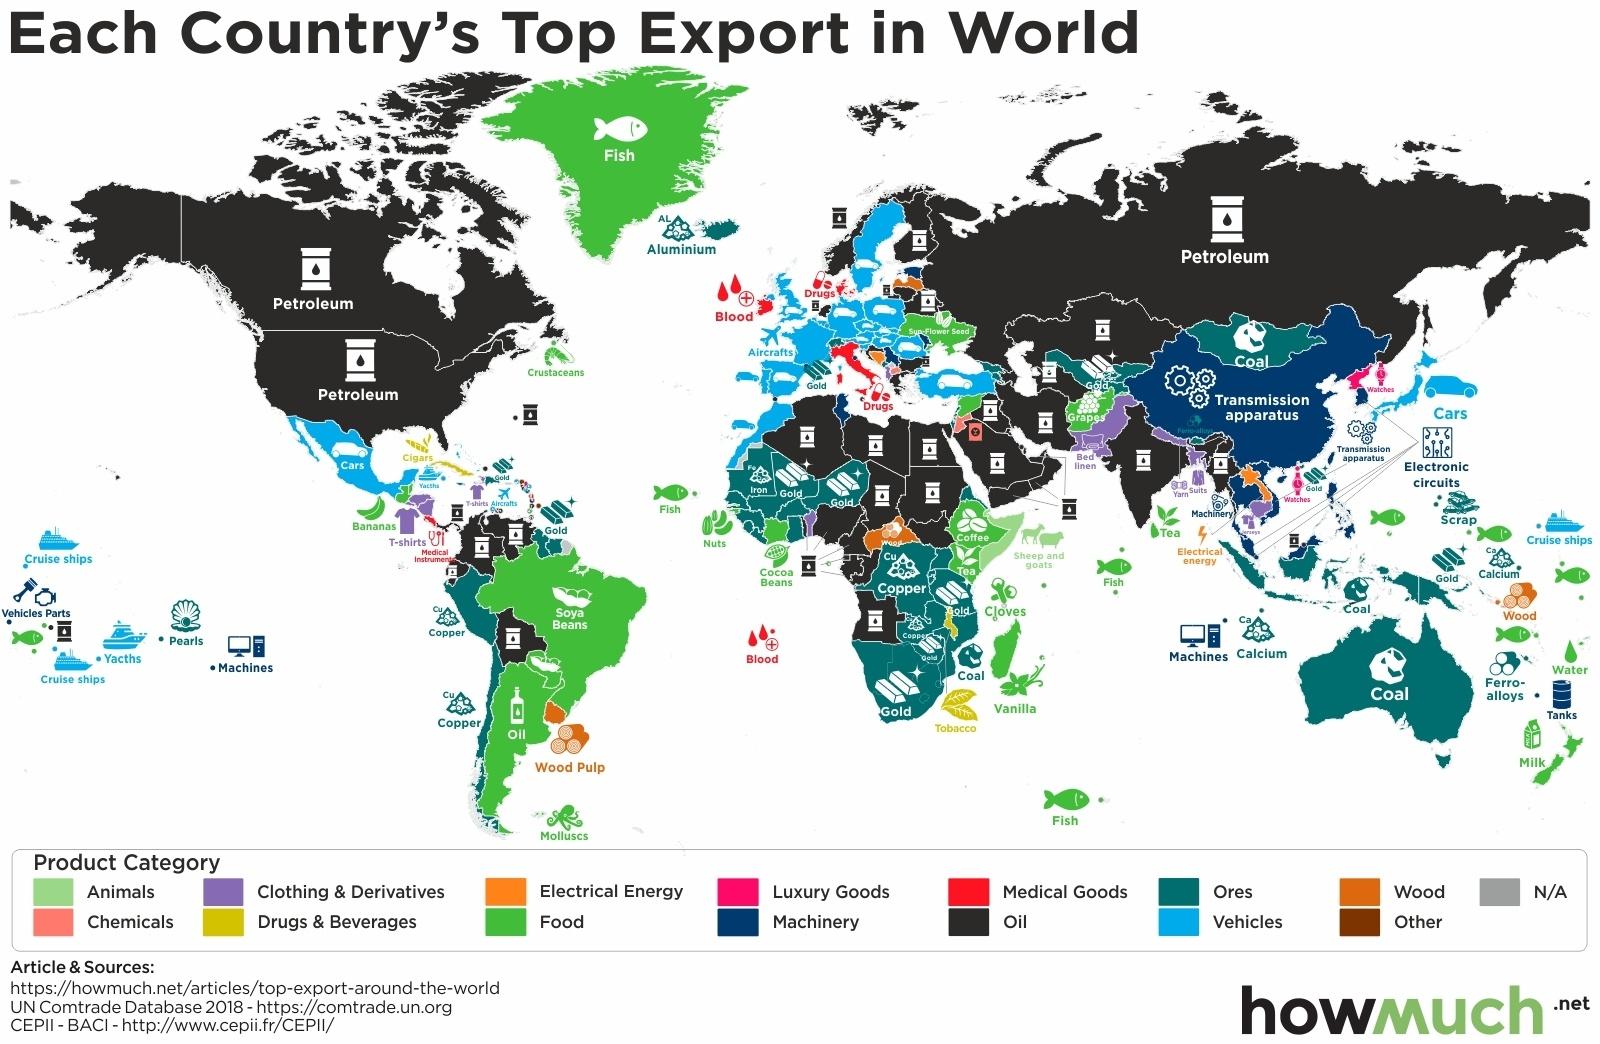 top-export-around-the-world-world-8679